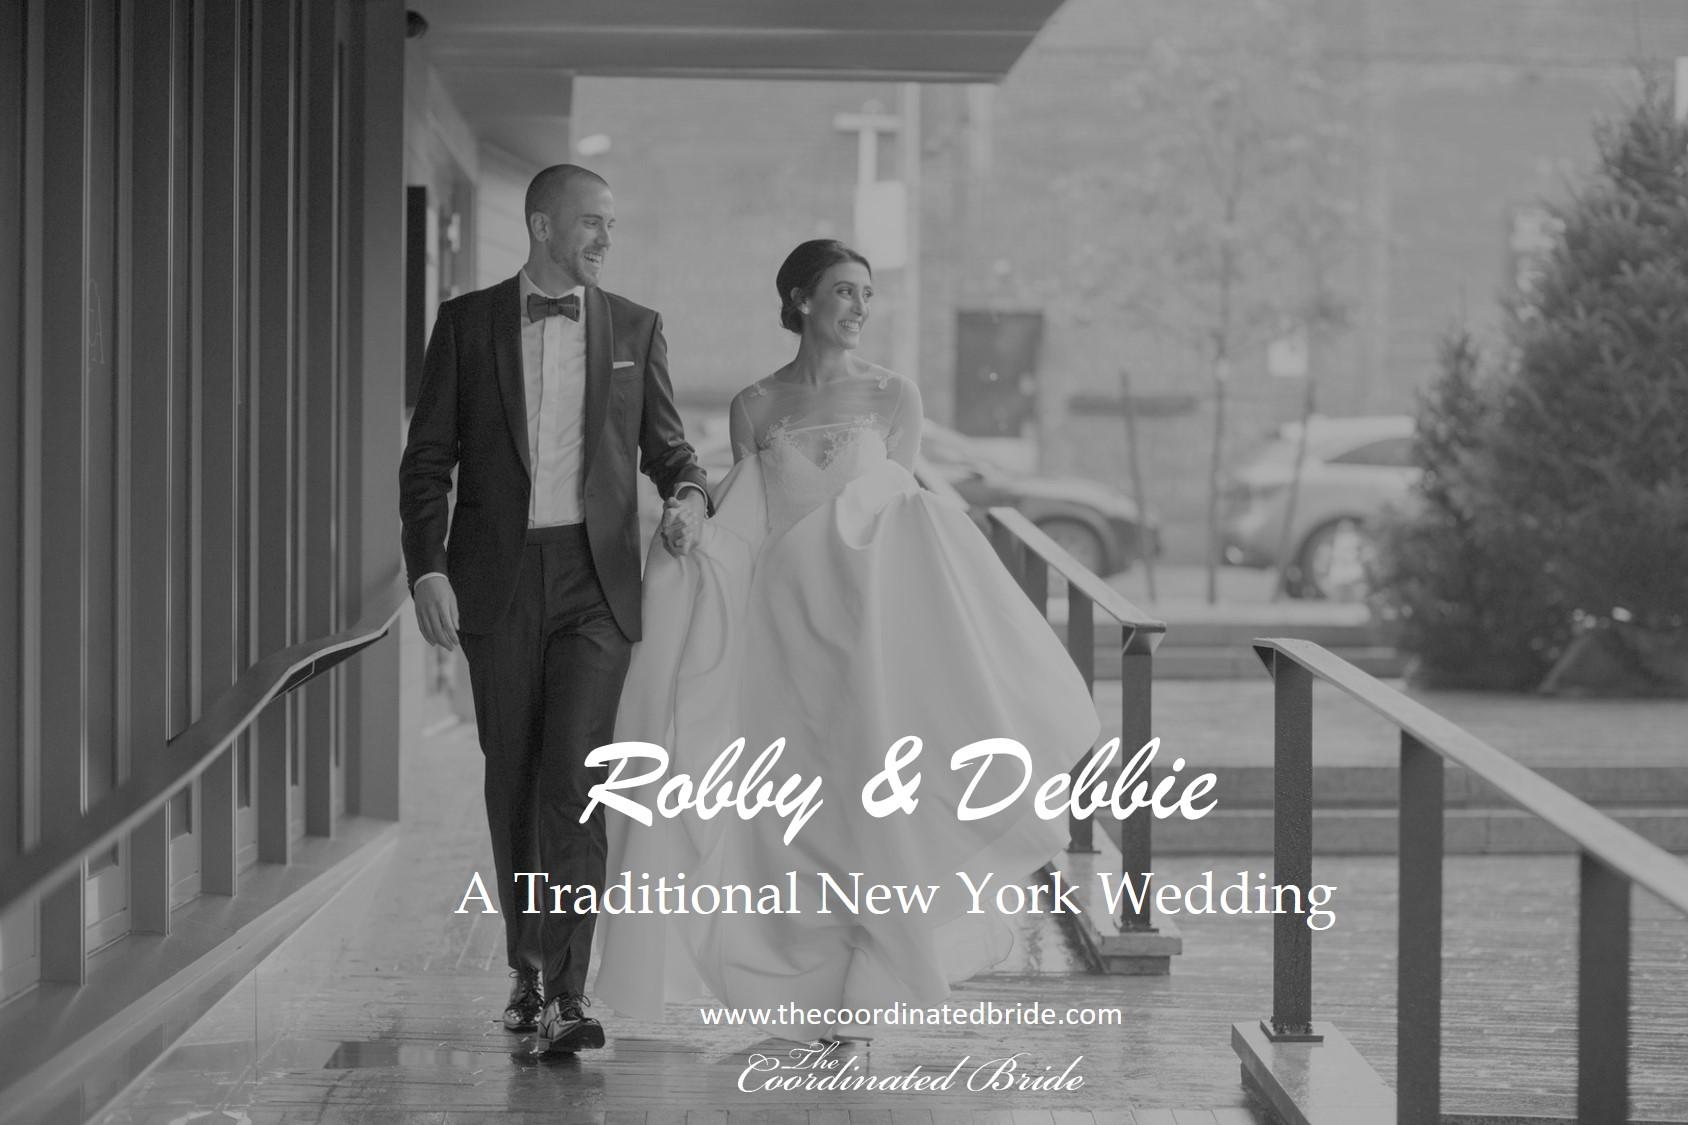 A Traditional New York Wedding, Robby & Debbie